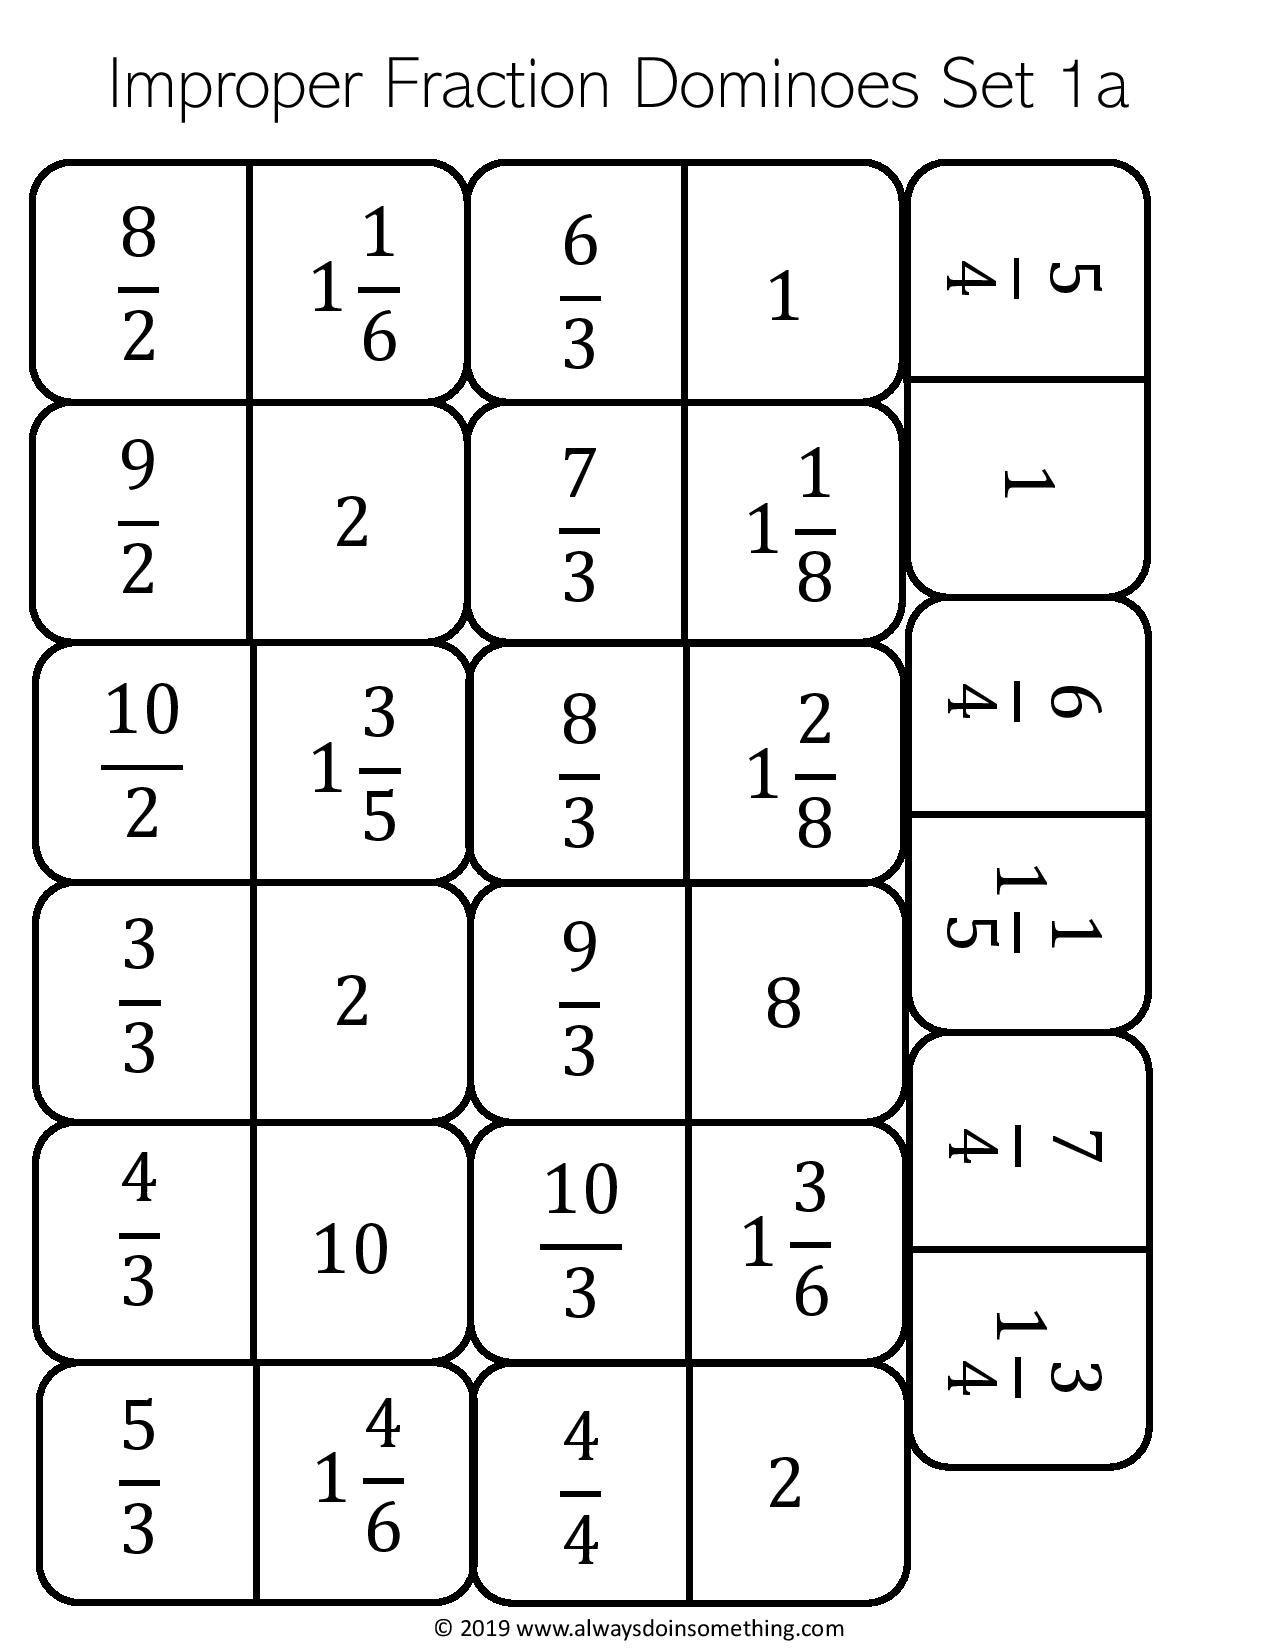 Improper Fraction Dominoes